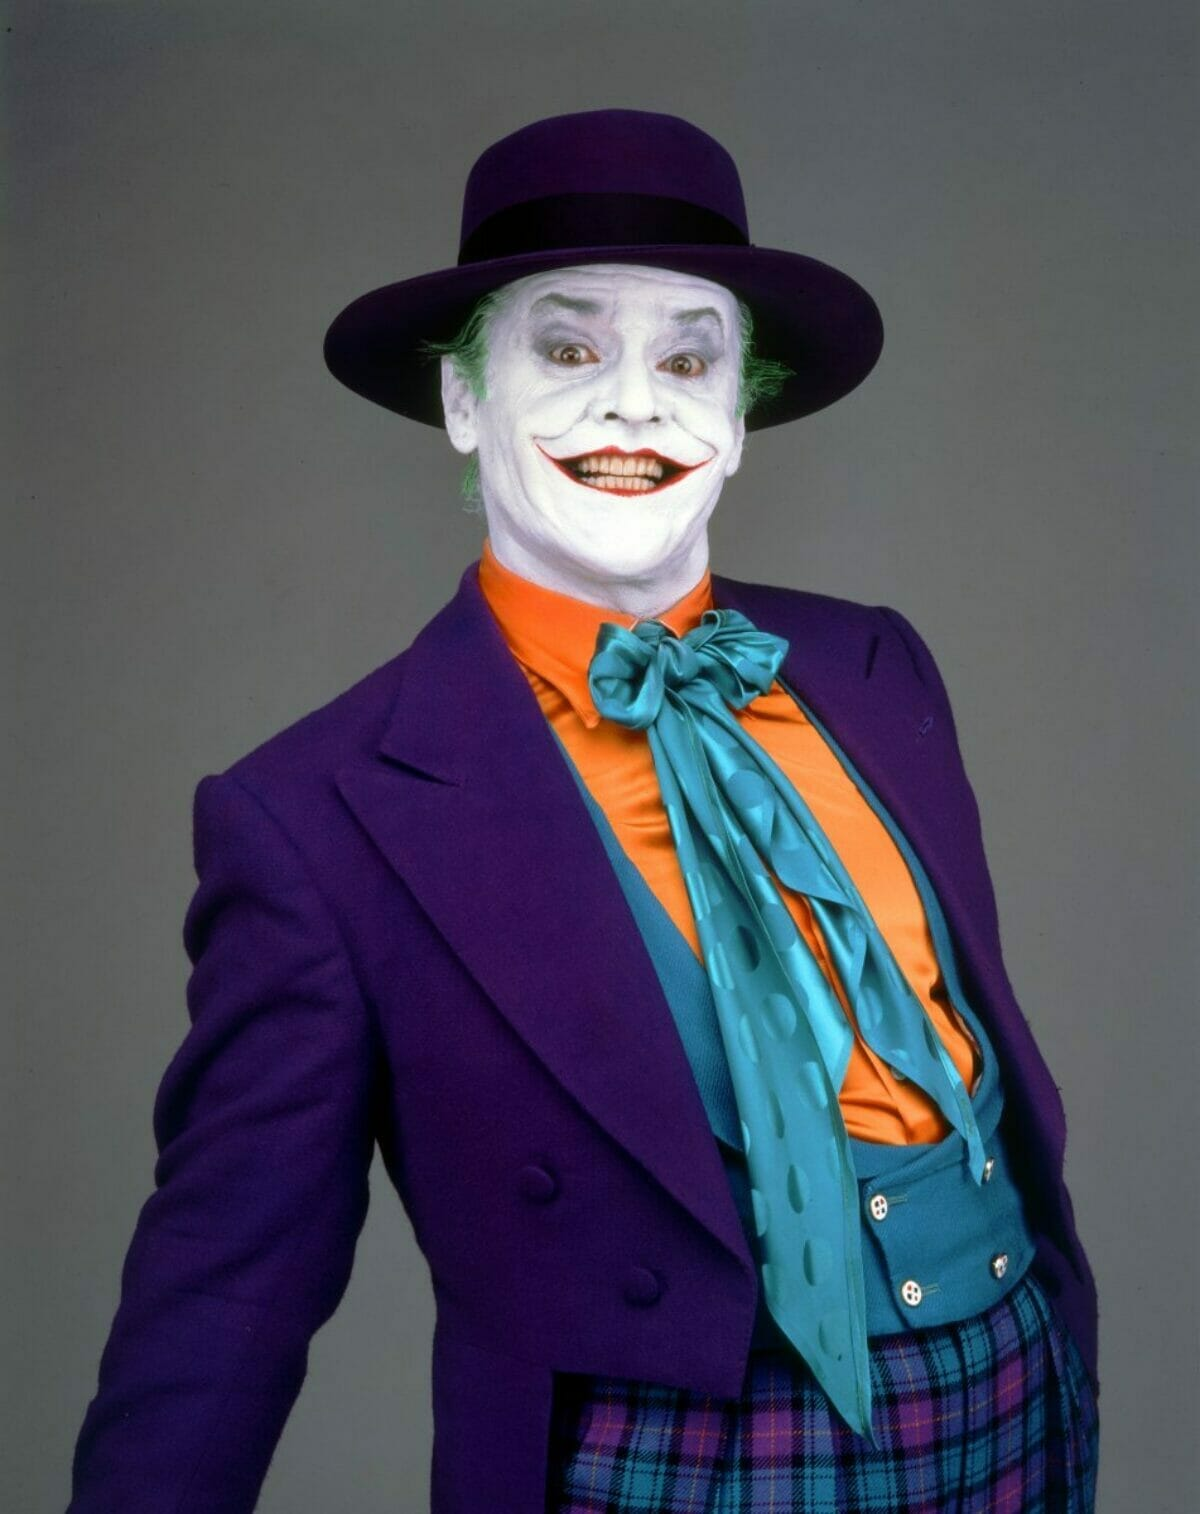 Jack_Nicholson_The_Joker